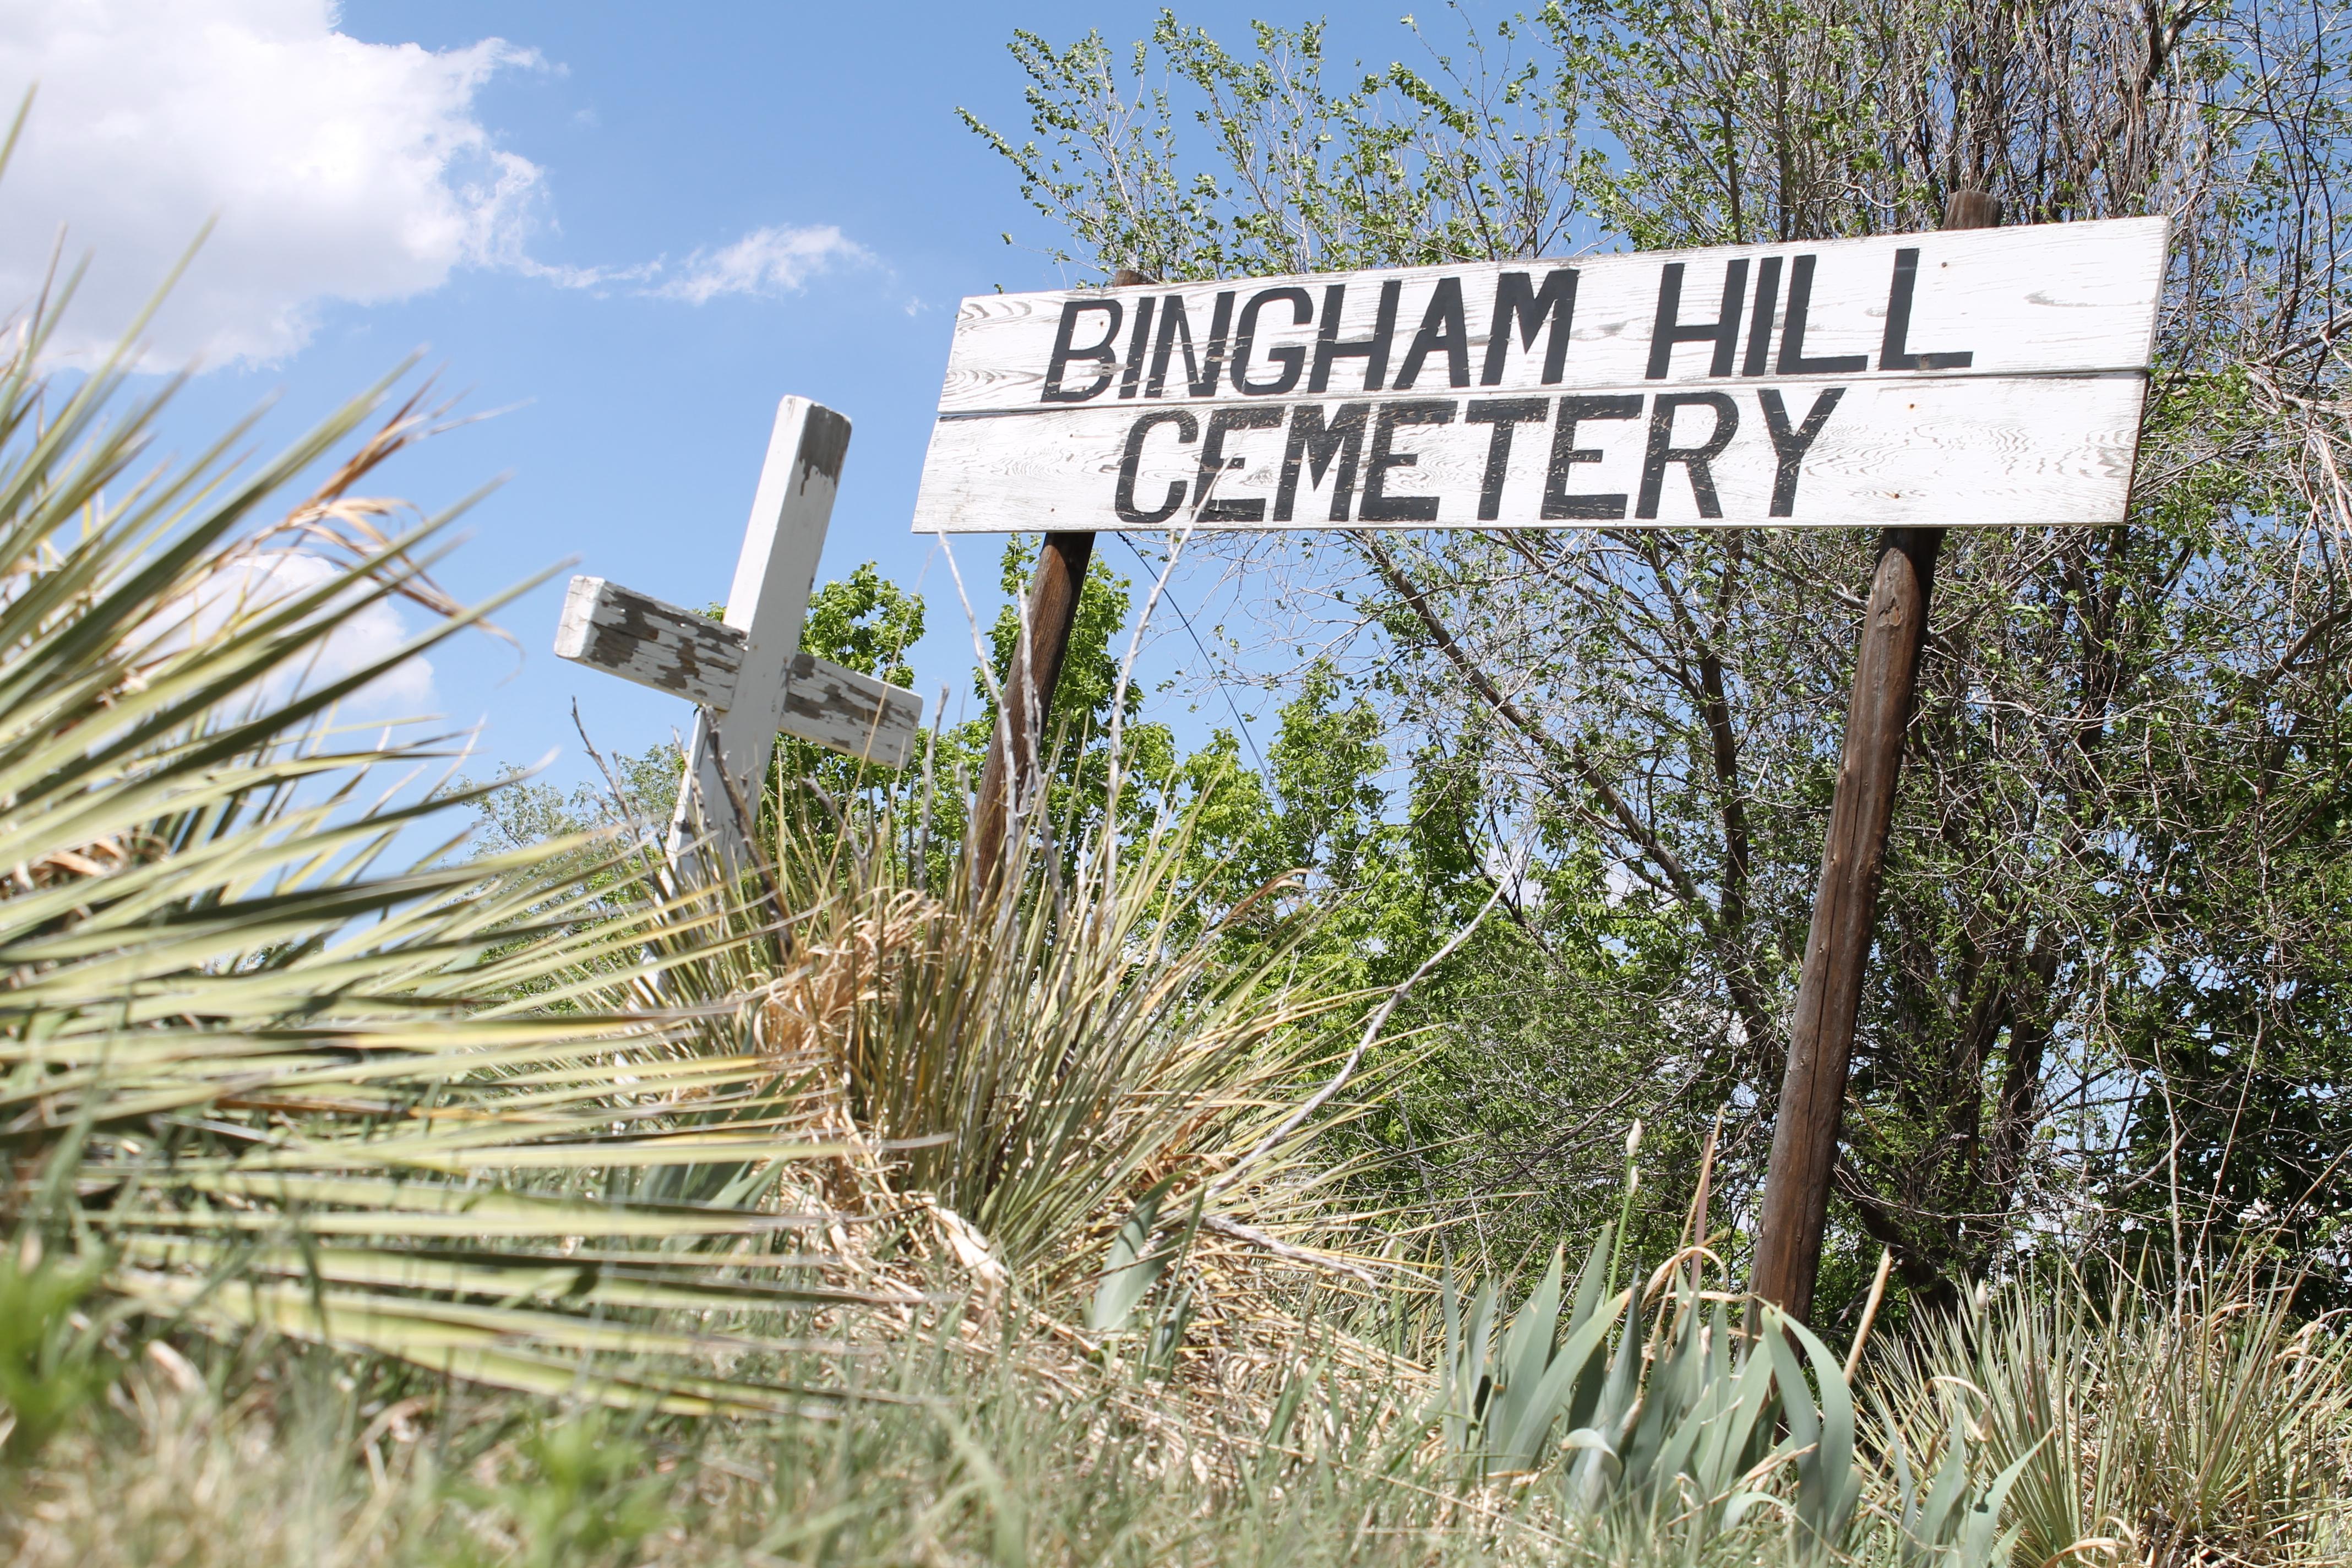 Bingham Hill Cemetery